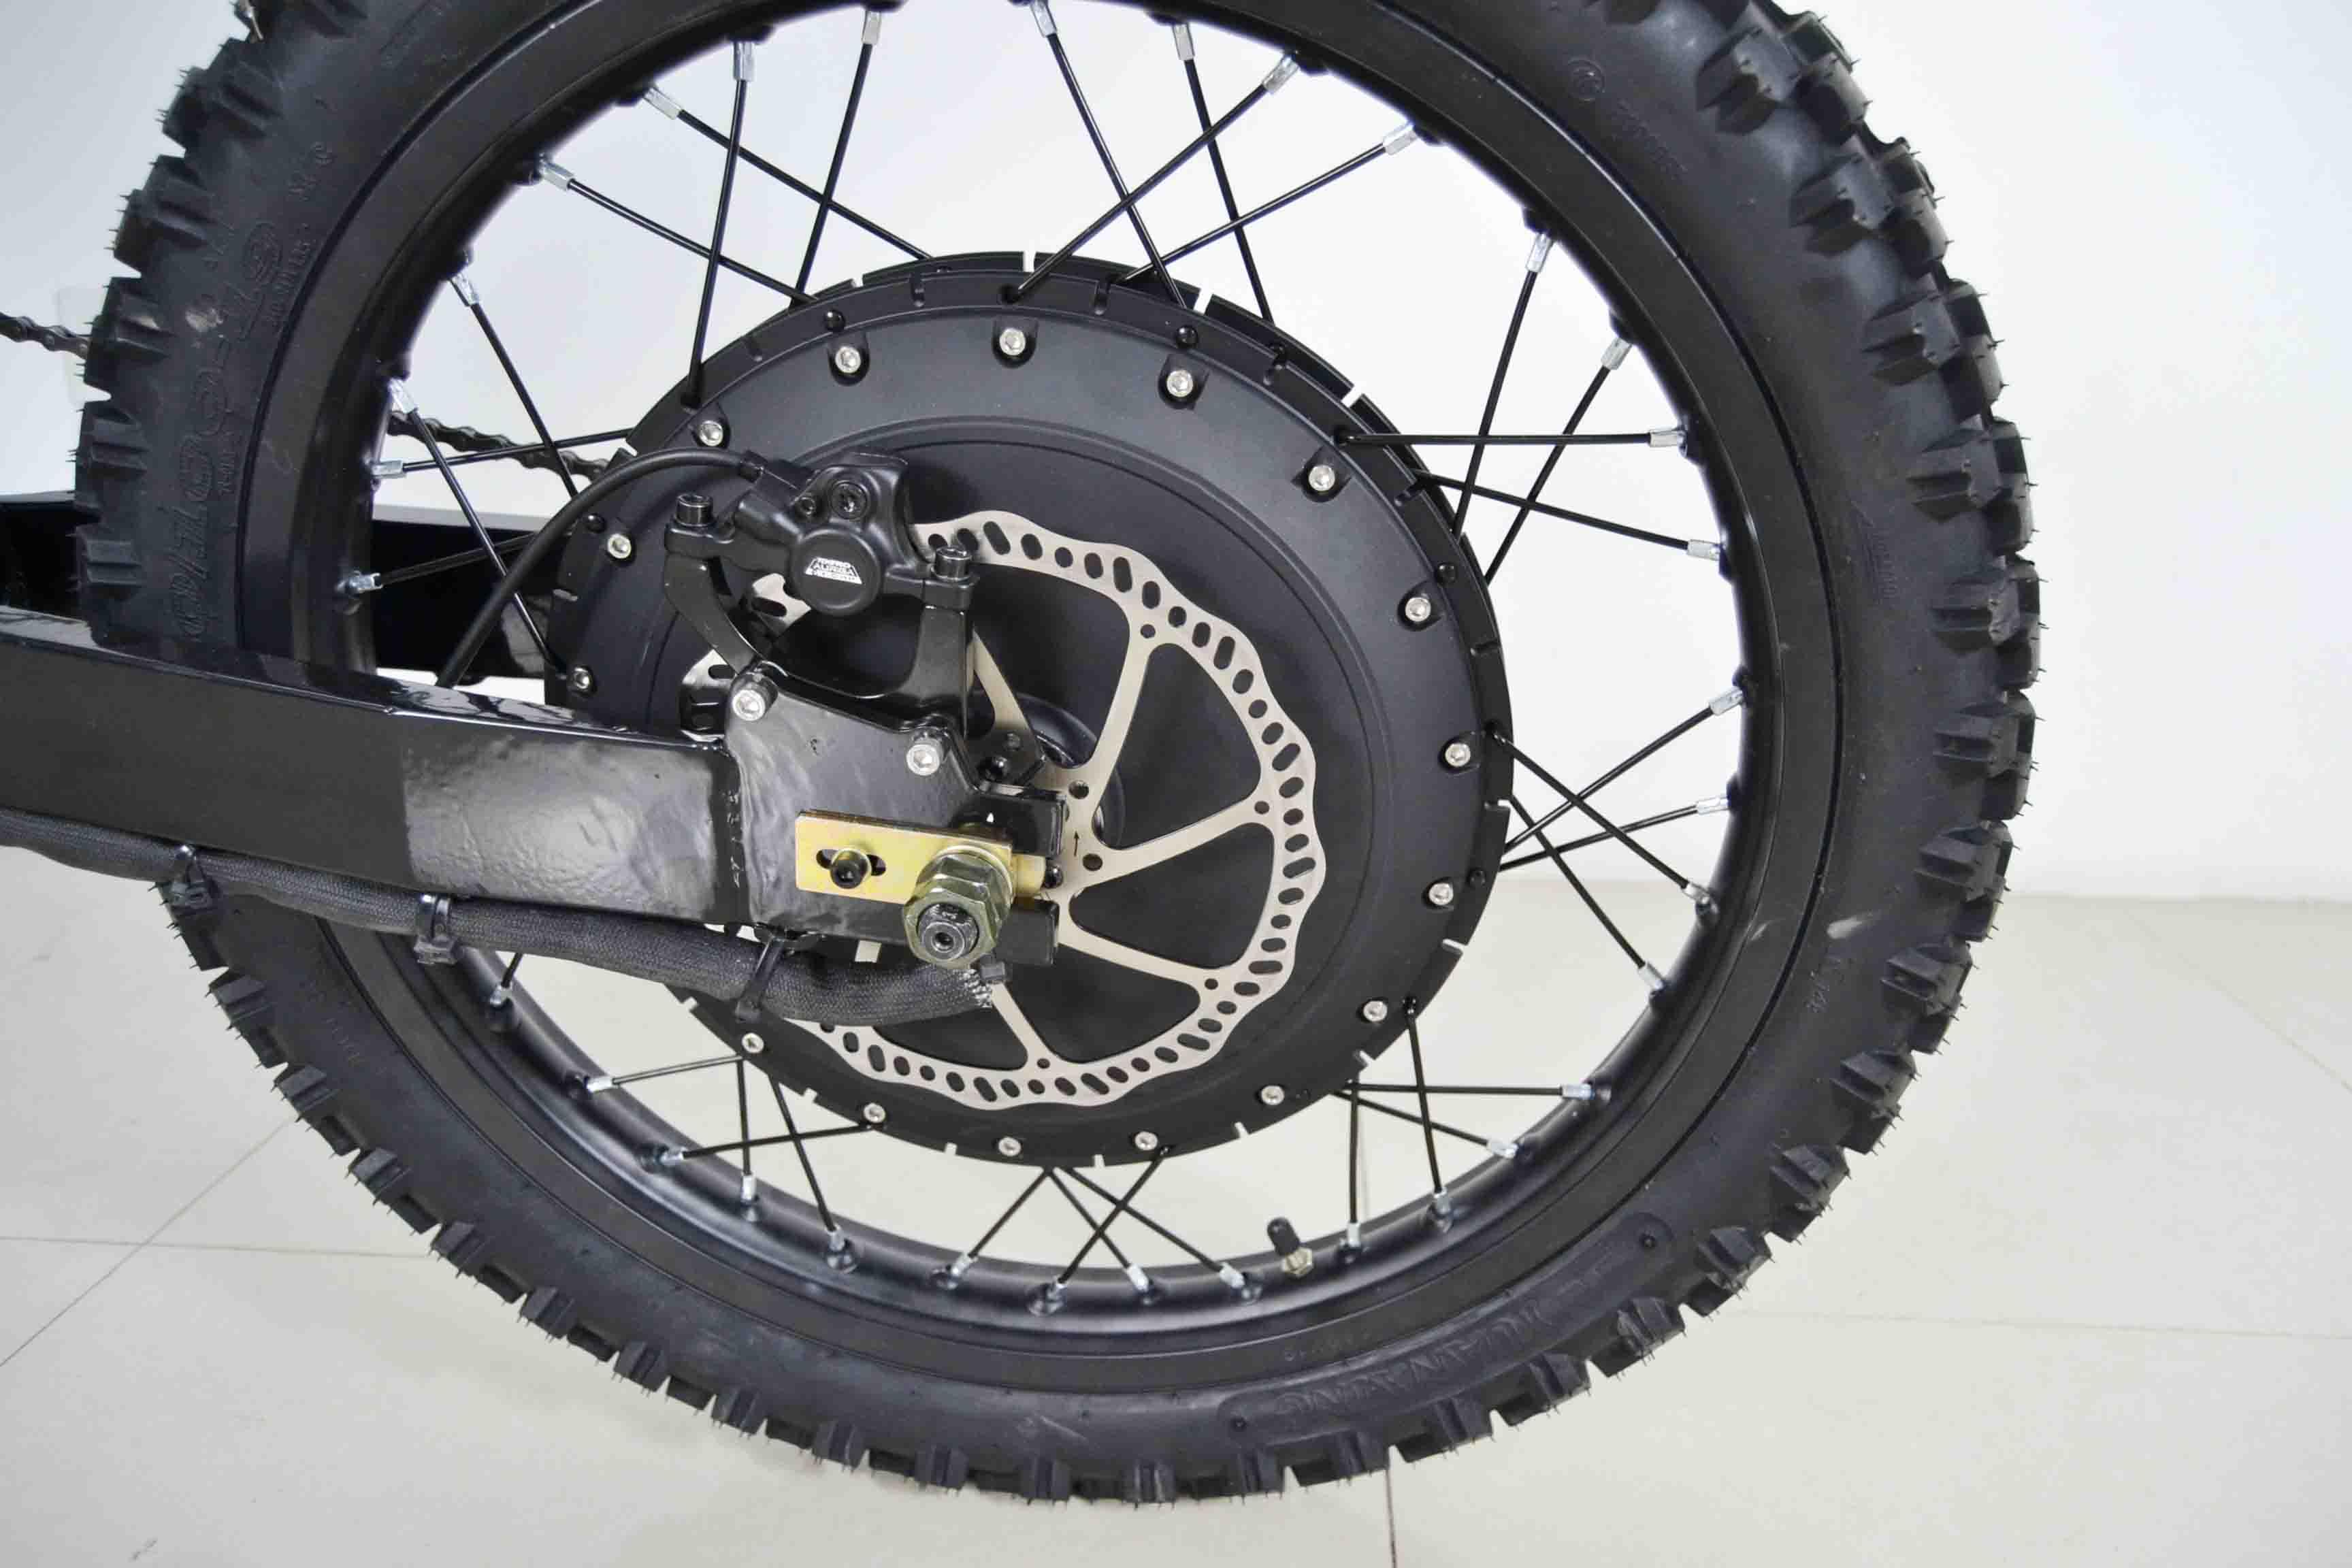 2021 Sunny Hot 3000W 5000W 8000W e bikes electric bike bicycle stealth bomber electric bike